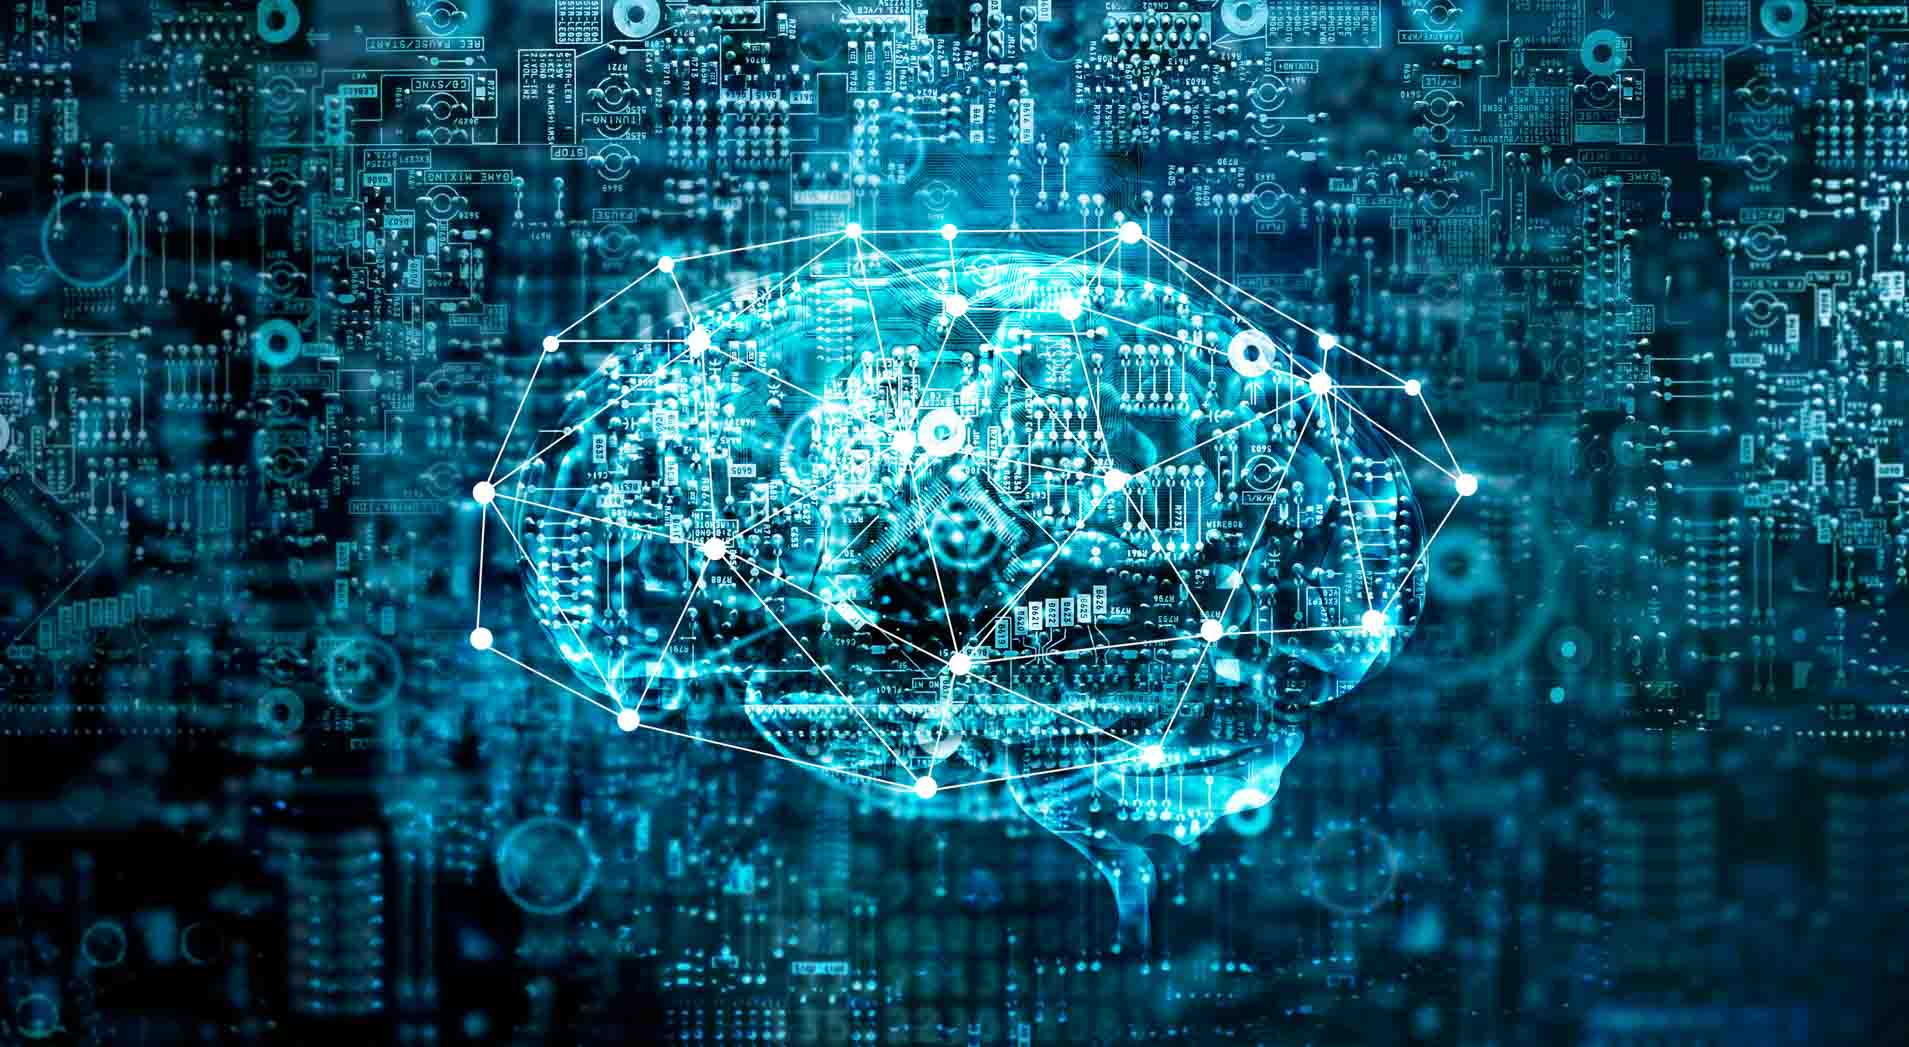 Illustration of brain using code